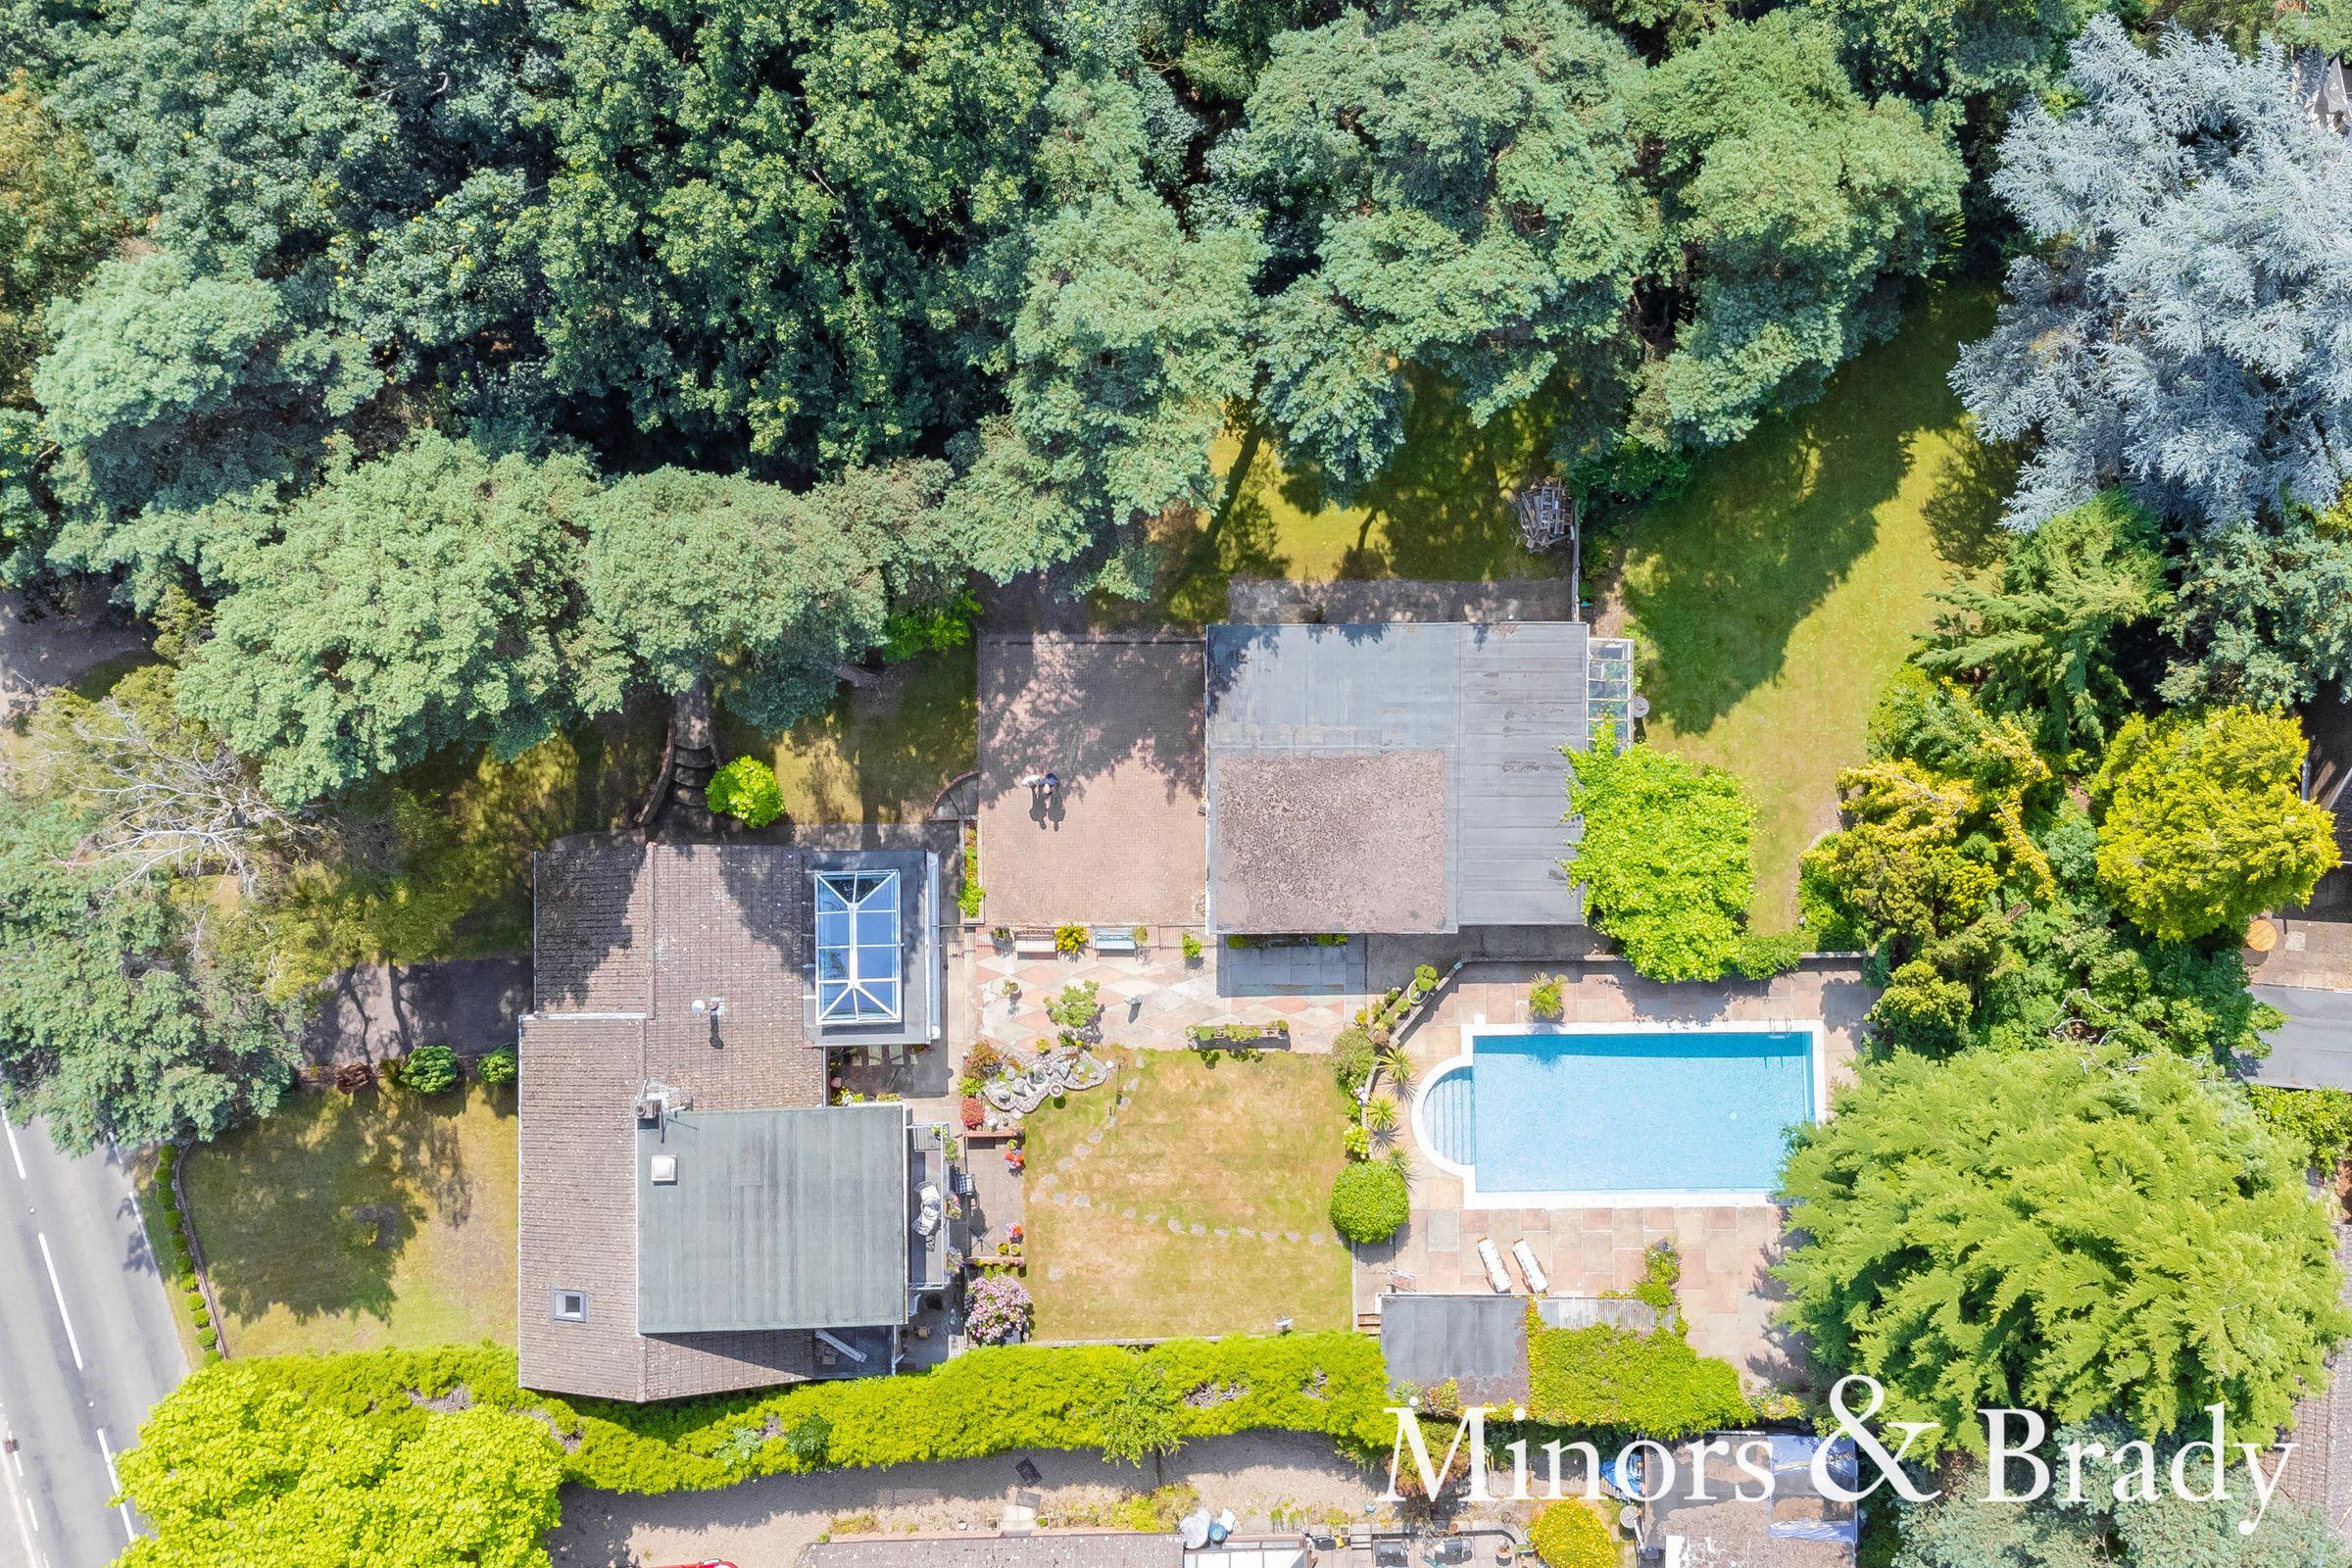 Property photo 1 of 49.